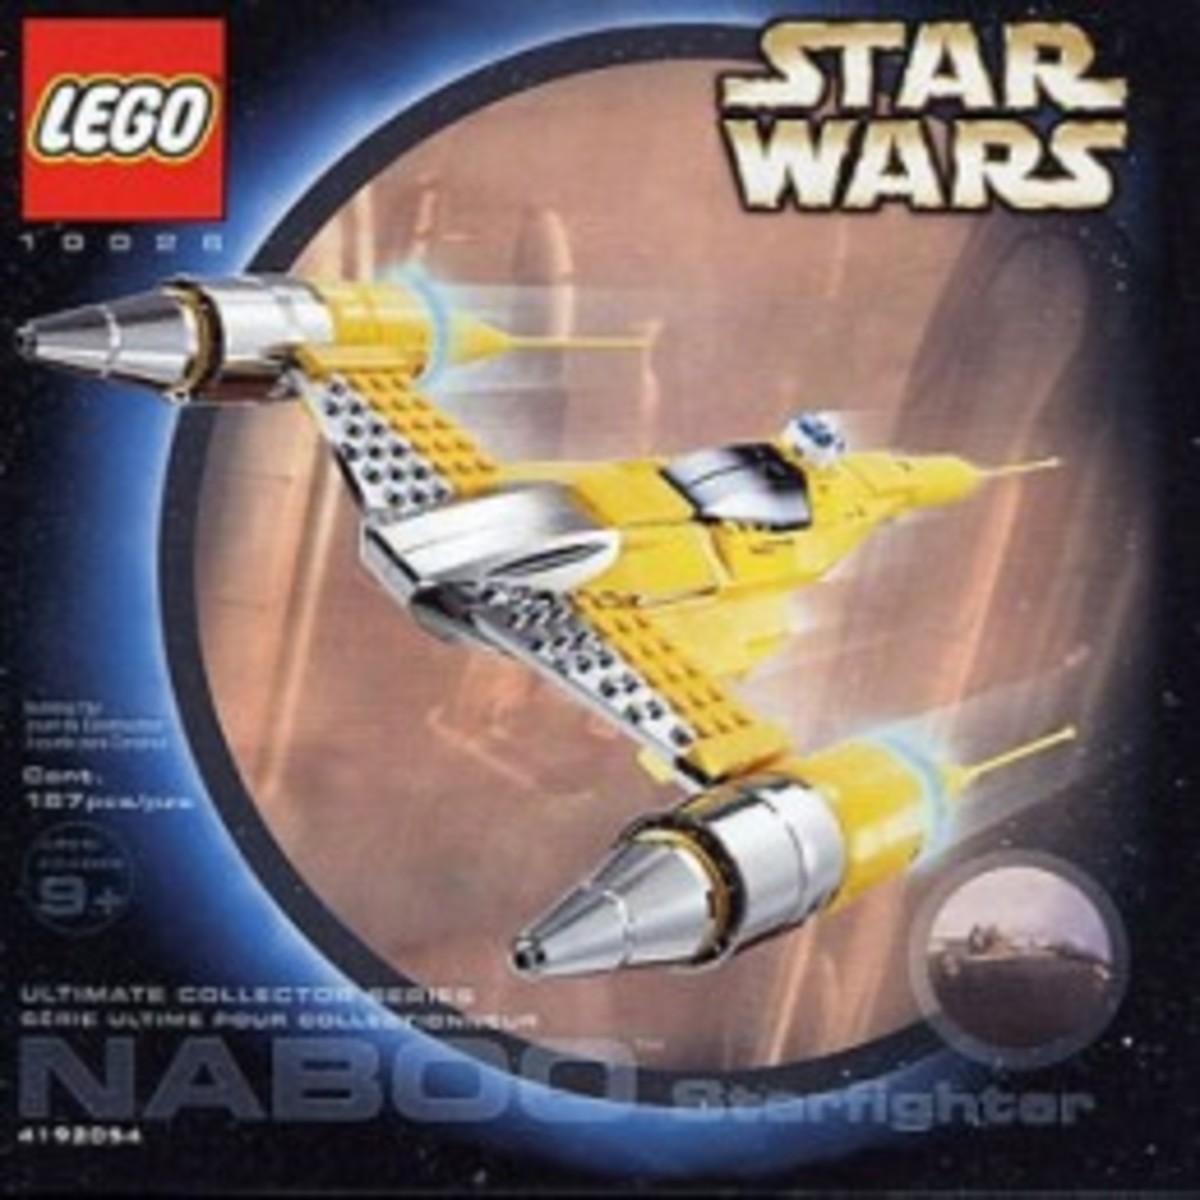 Lego Star Wars Naboo Starfighter 10026